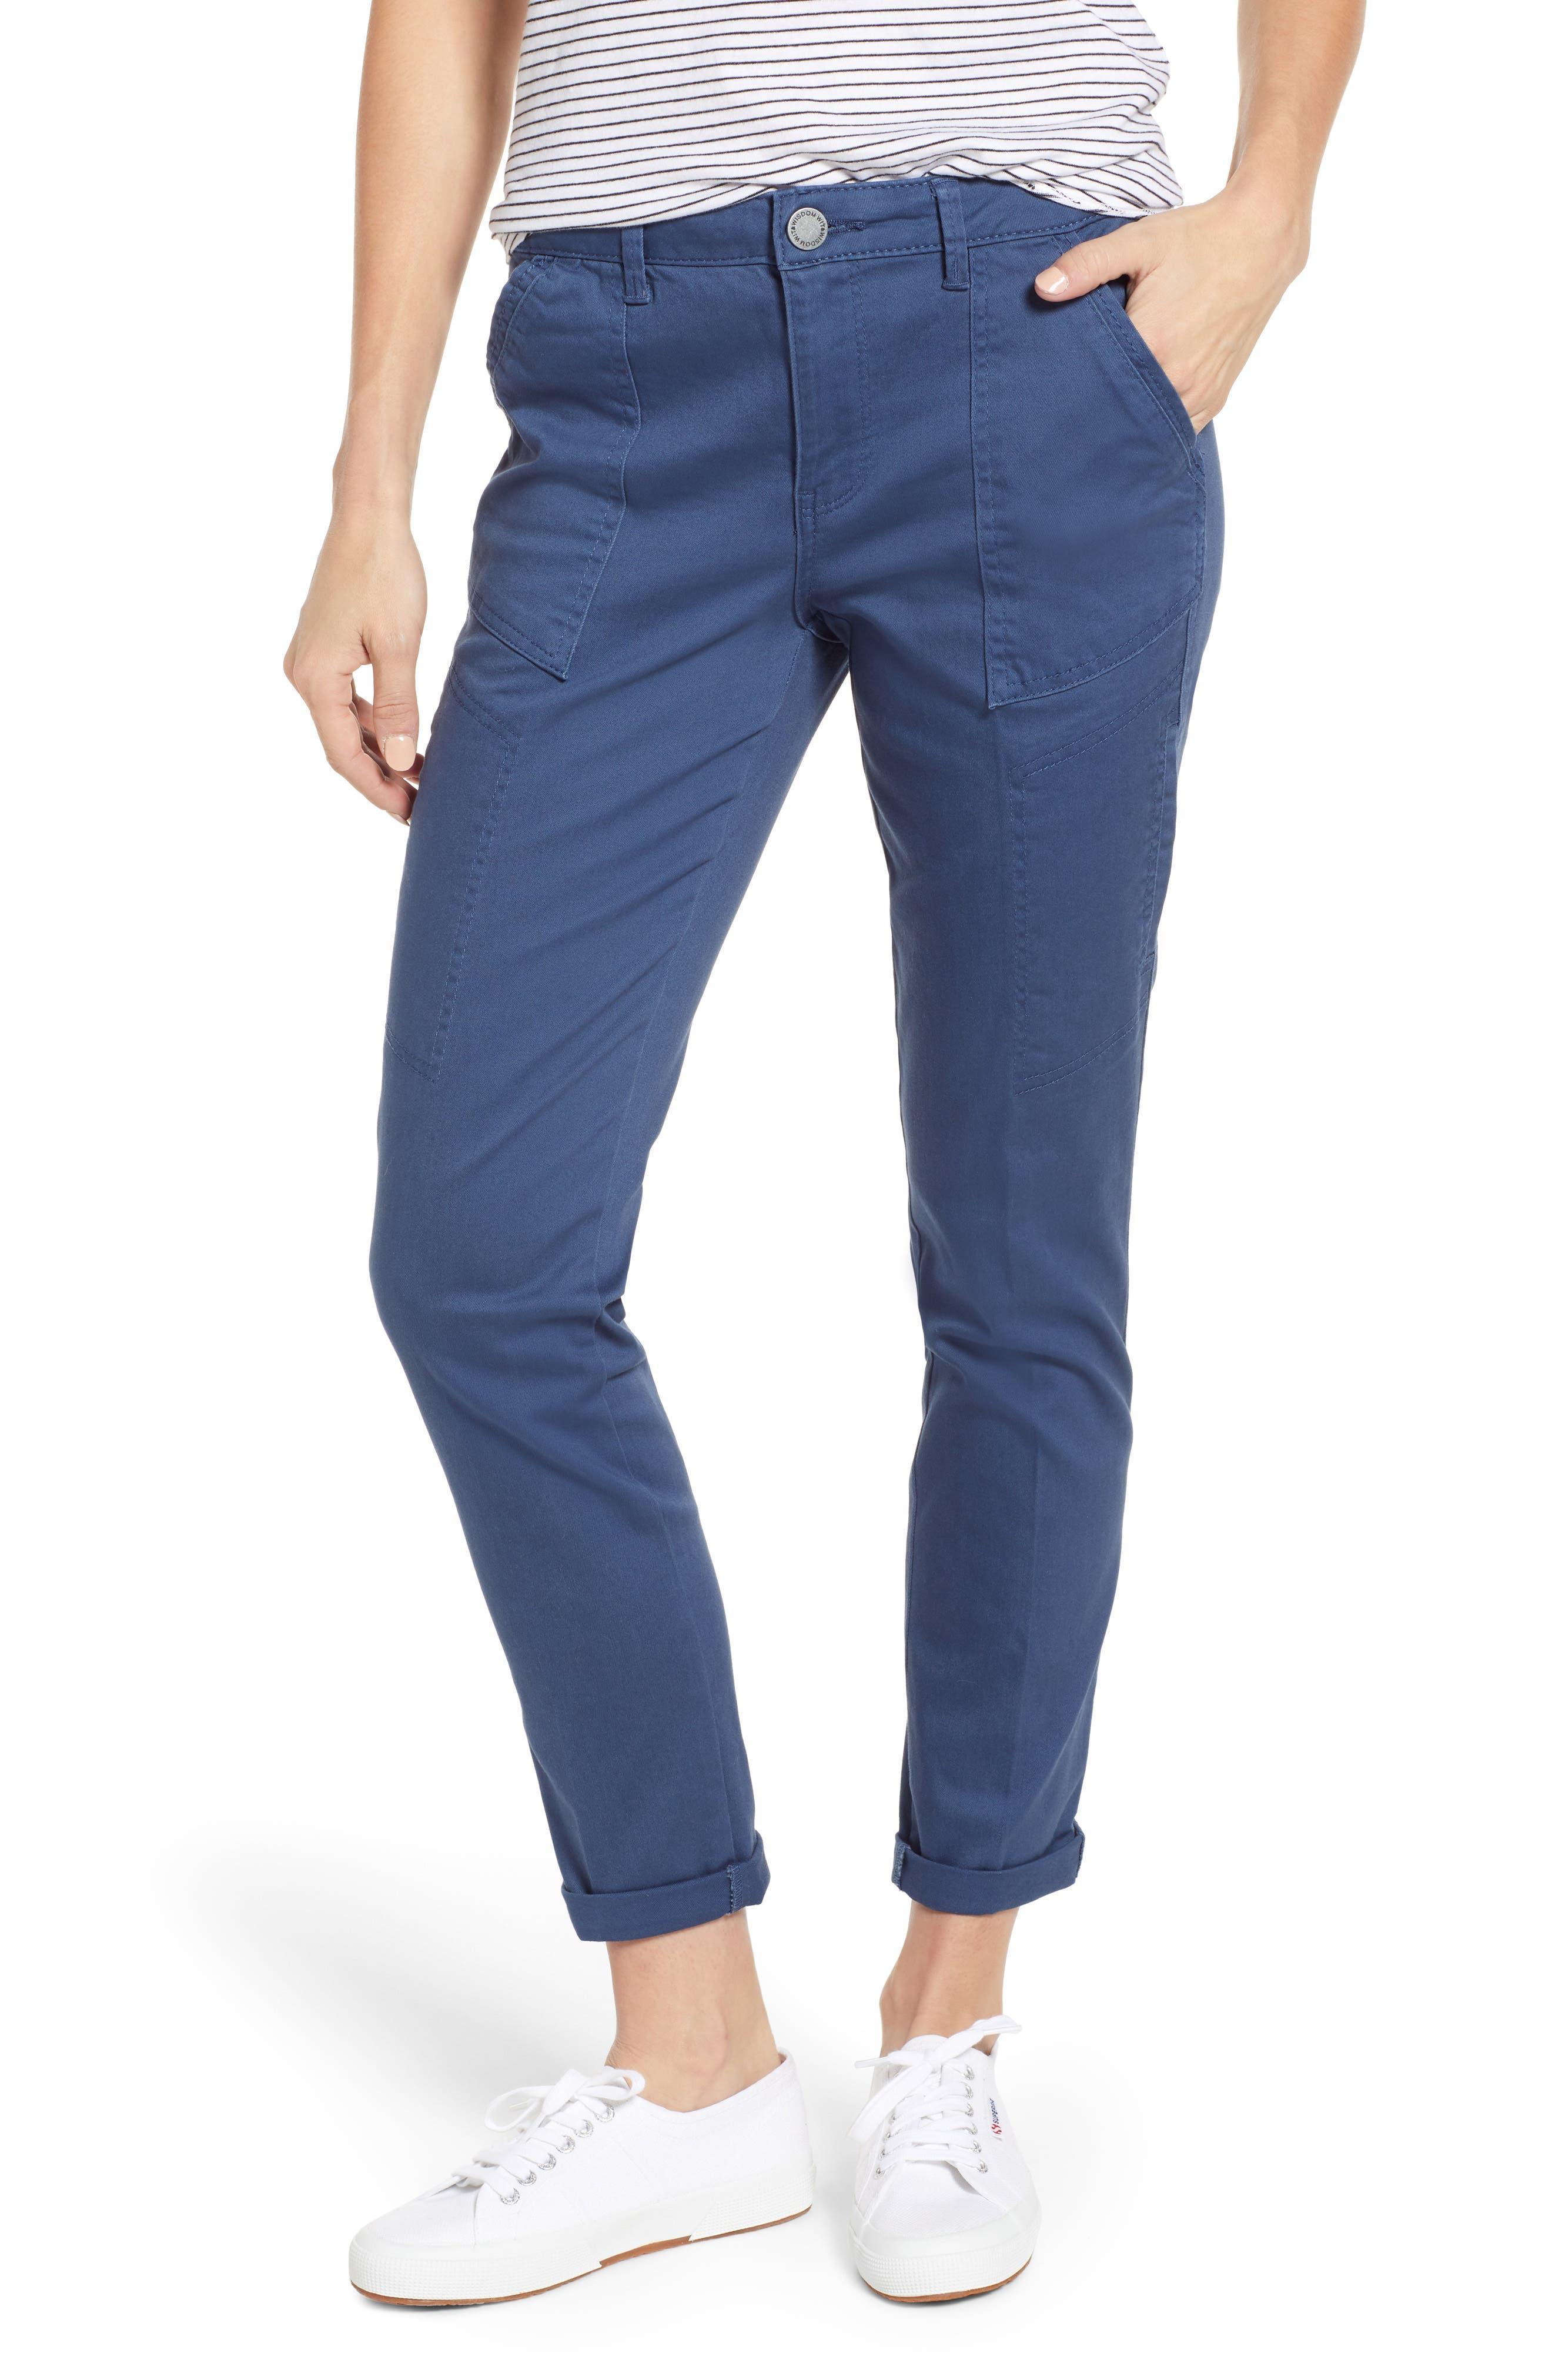 Wit & Wisdom Flex-Ellent High Waist Cargo Pants, Blue